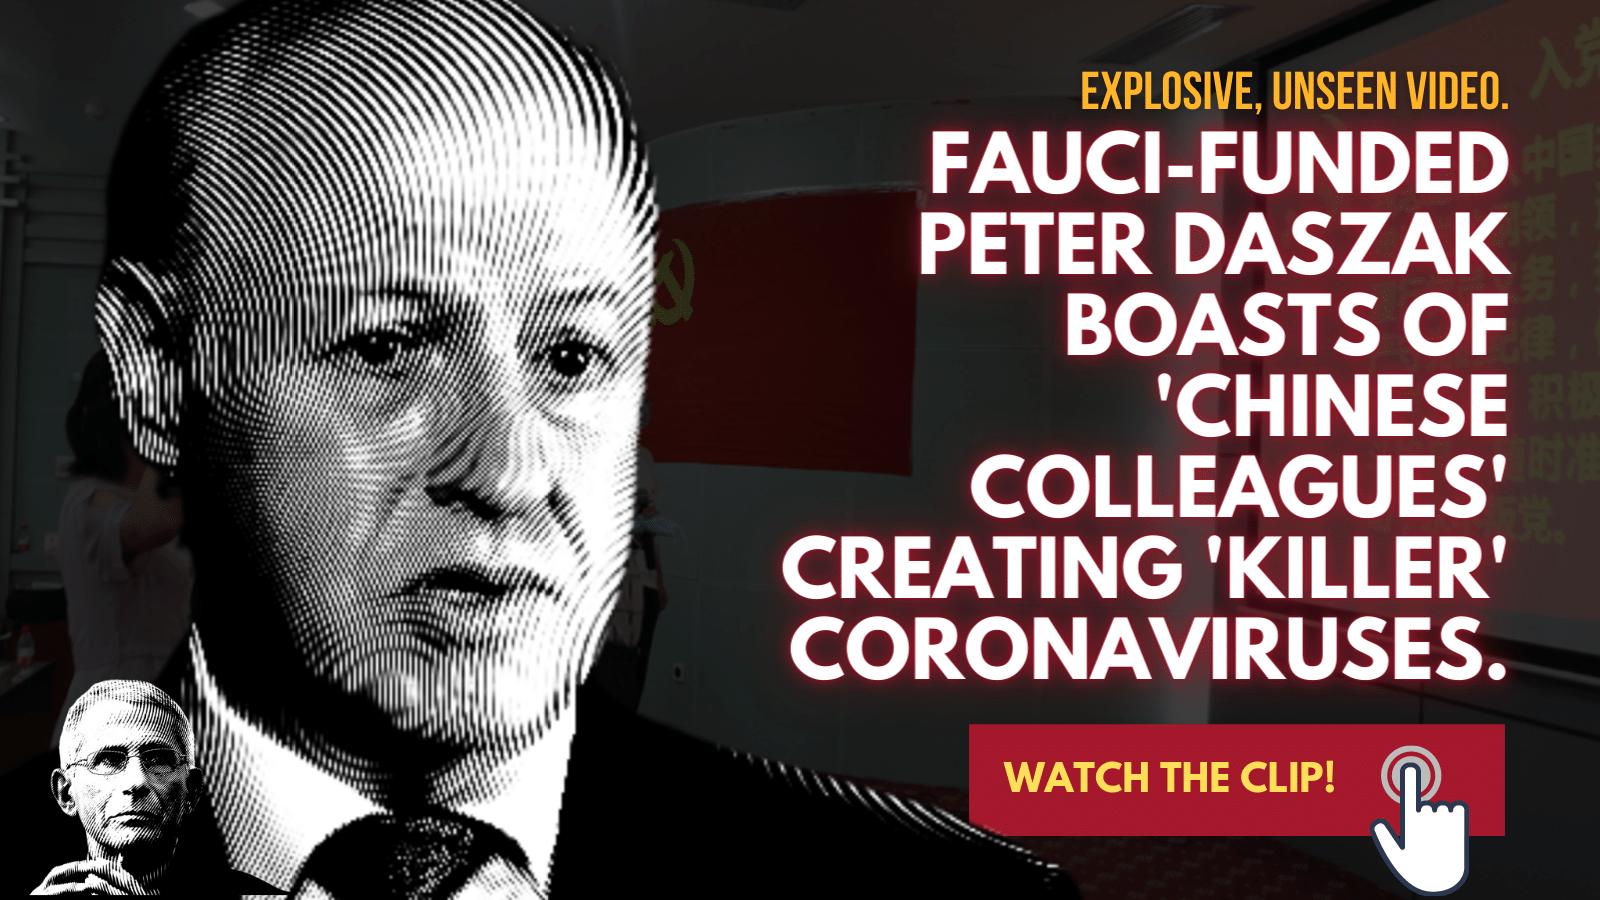 WATCH: Explosive, Unearthed Video Shows Peter Daszak Describing 'Chinese Colleagues' Developing 'Killer' Coronaviruses.